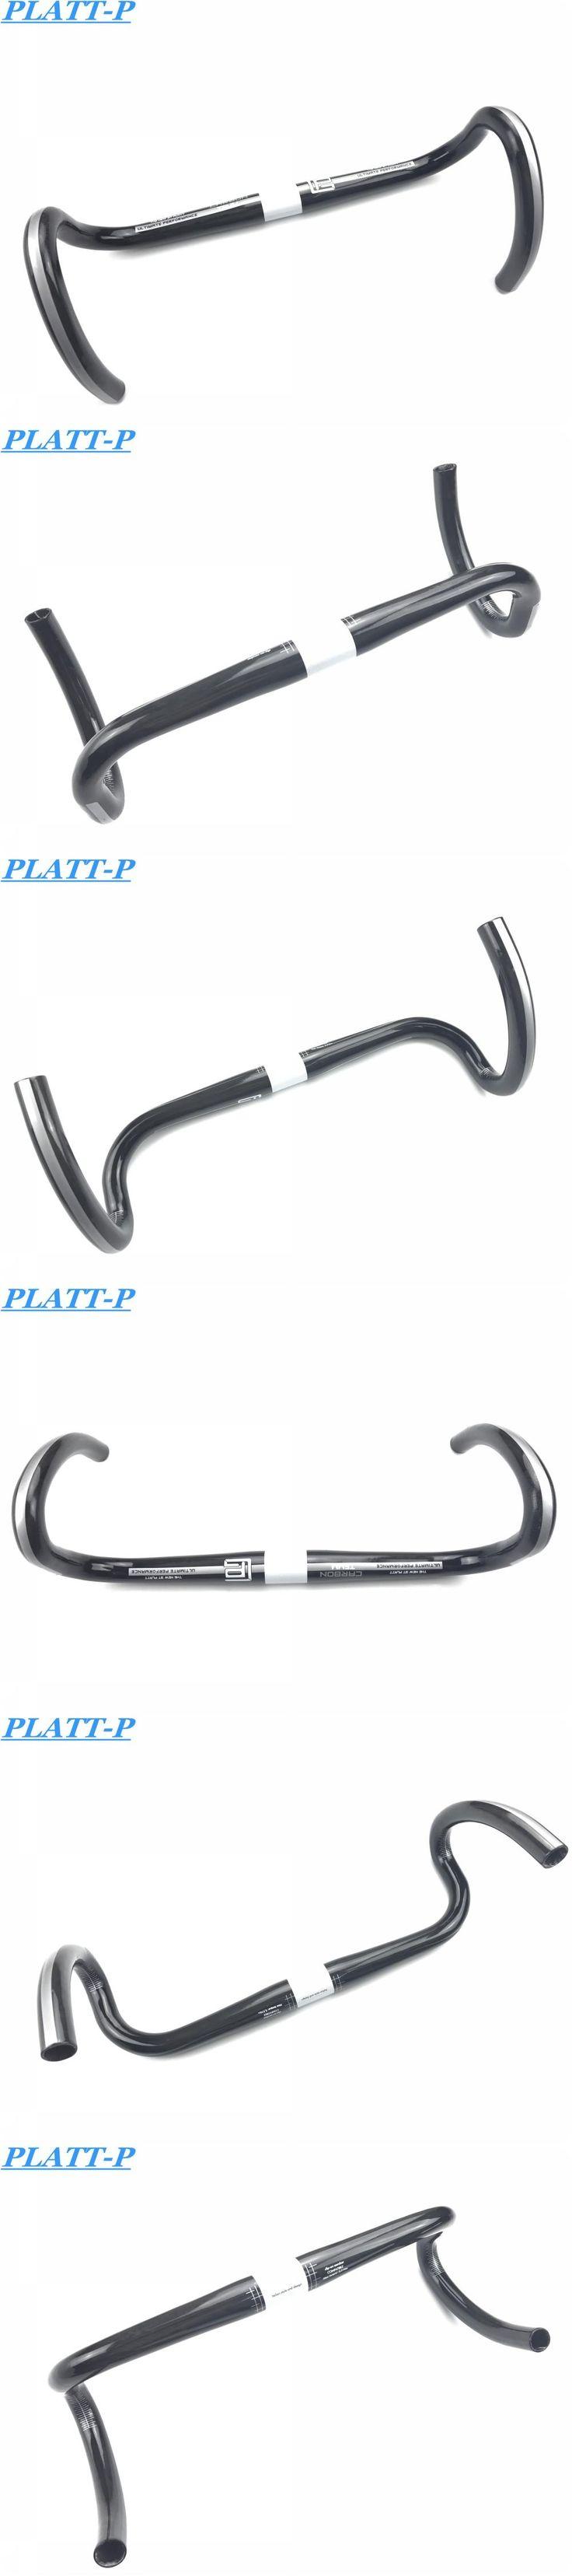 Date Lighter PLATT-P Road Bike UD Full Carbon Fiber Road Bike Parts 31.8 * 400/420 / 440mm Shiny Mat